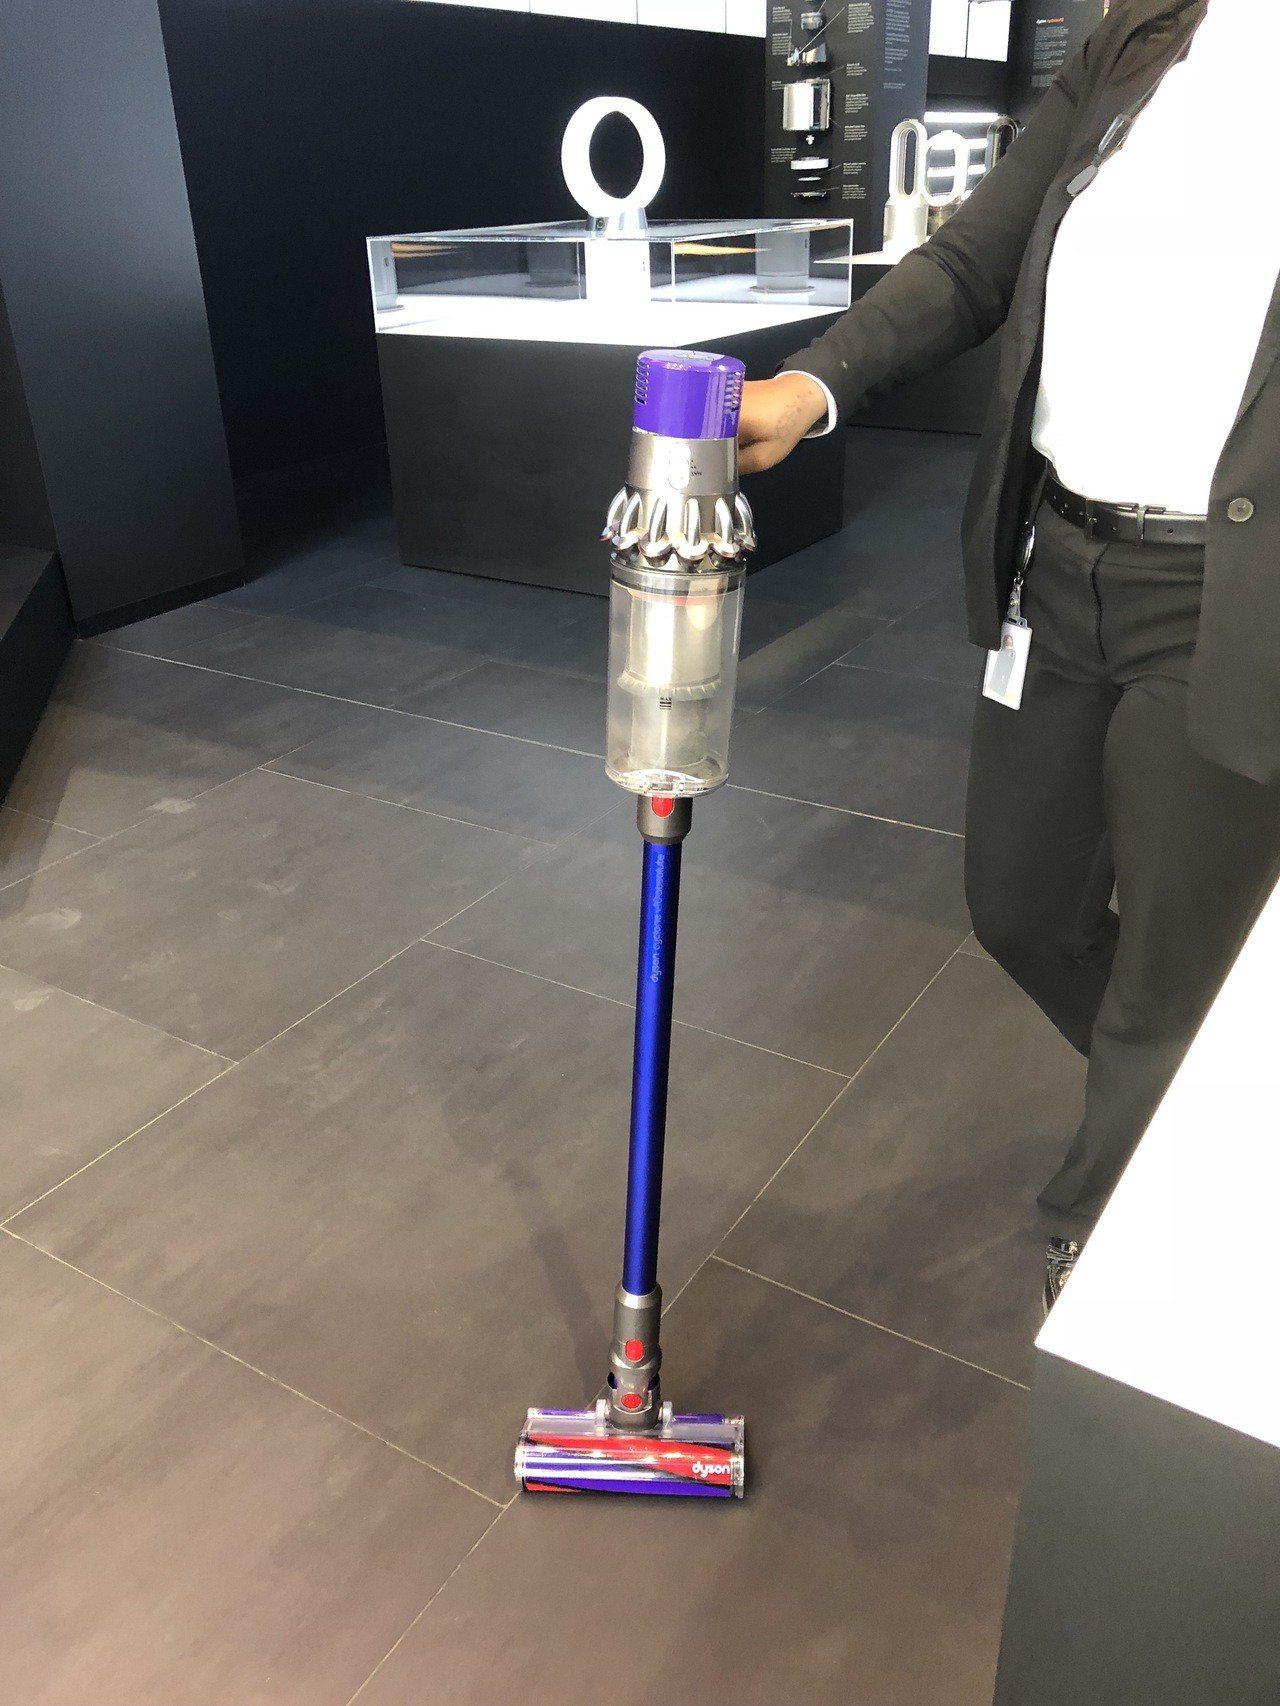 Dyson Cyclone V10一直線的集塵結構設計,讓吸力更強、手持更省力。...